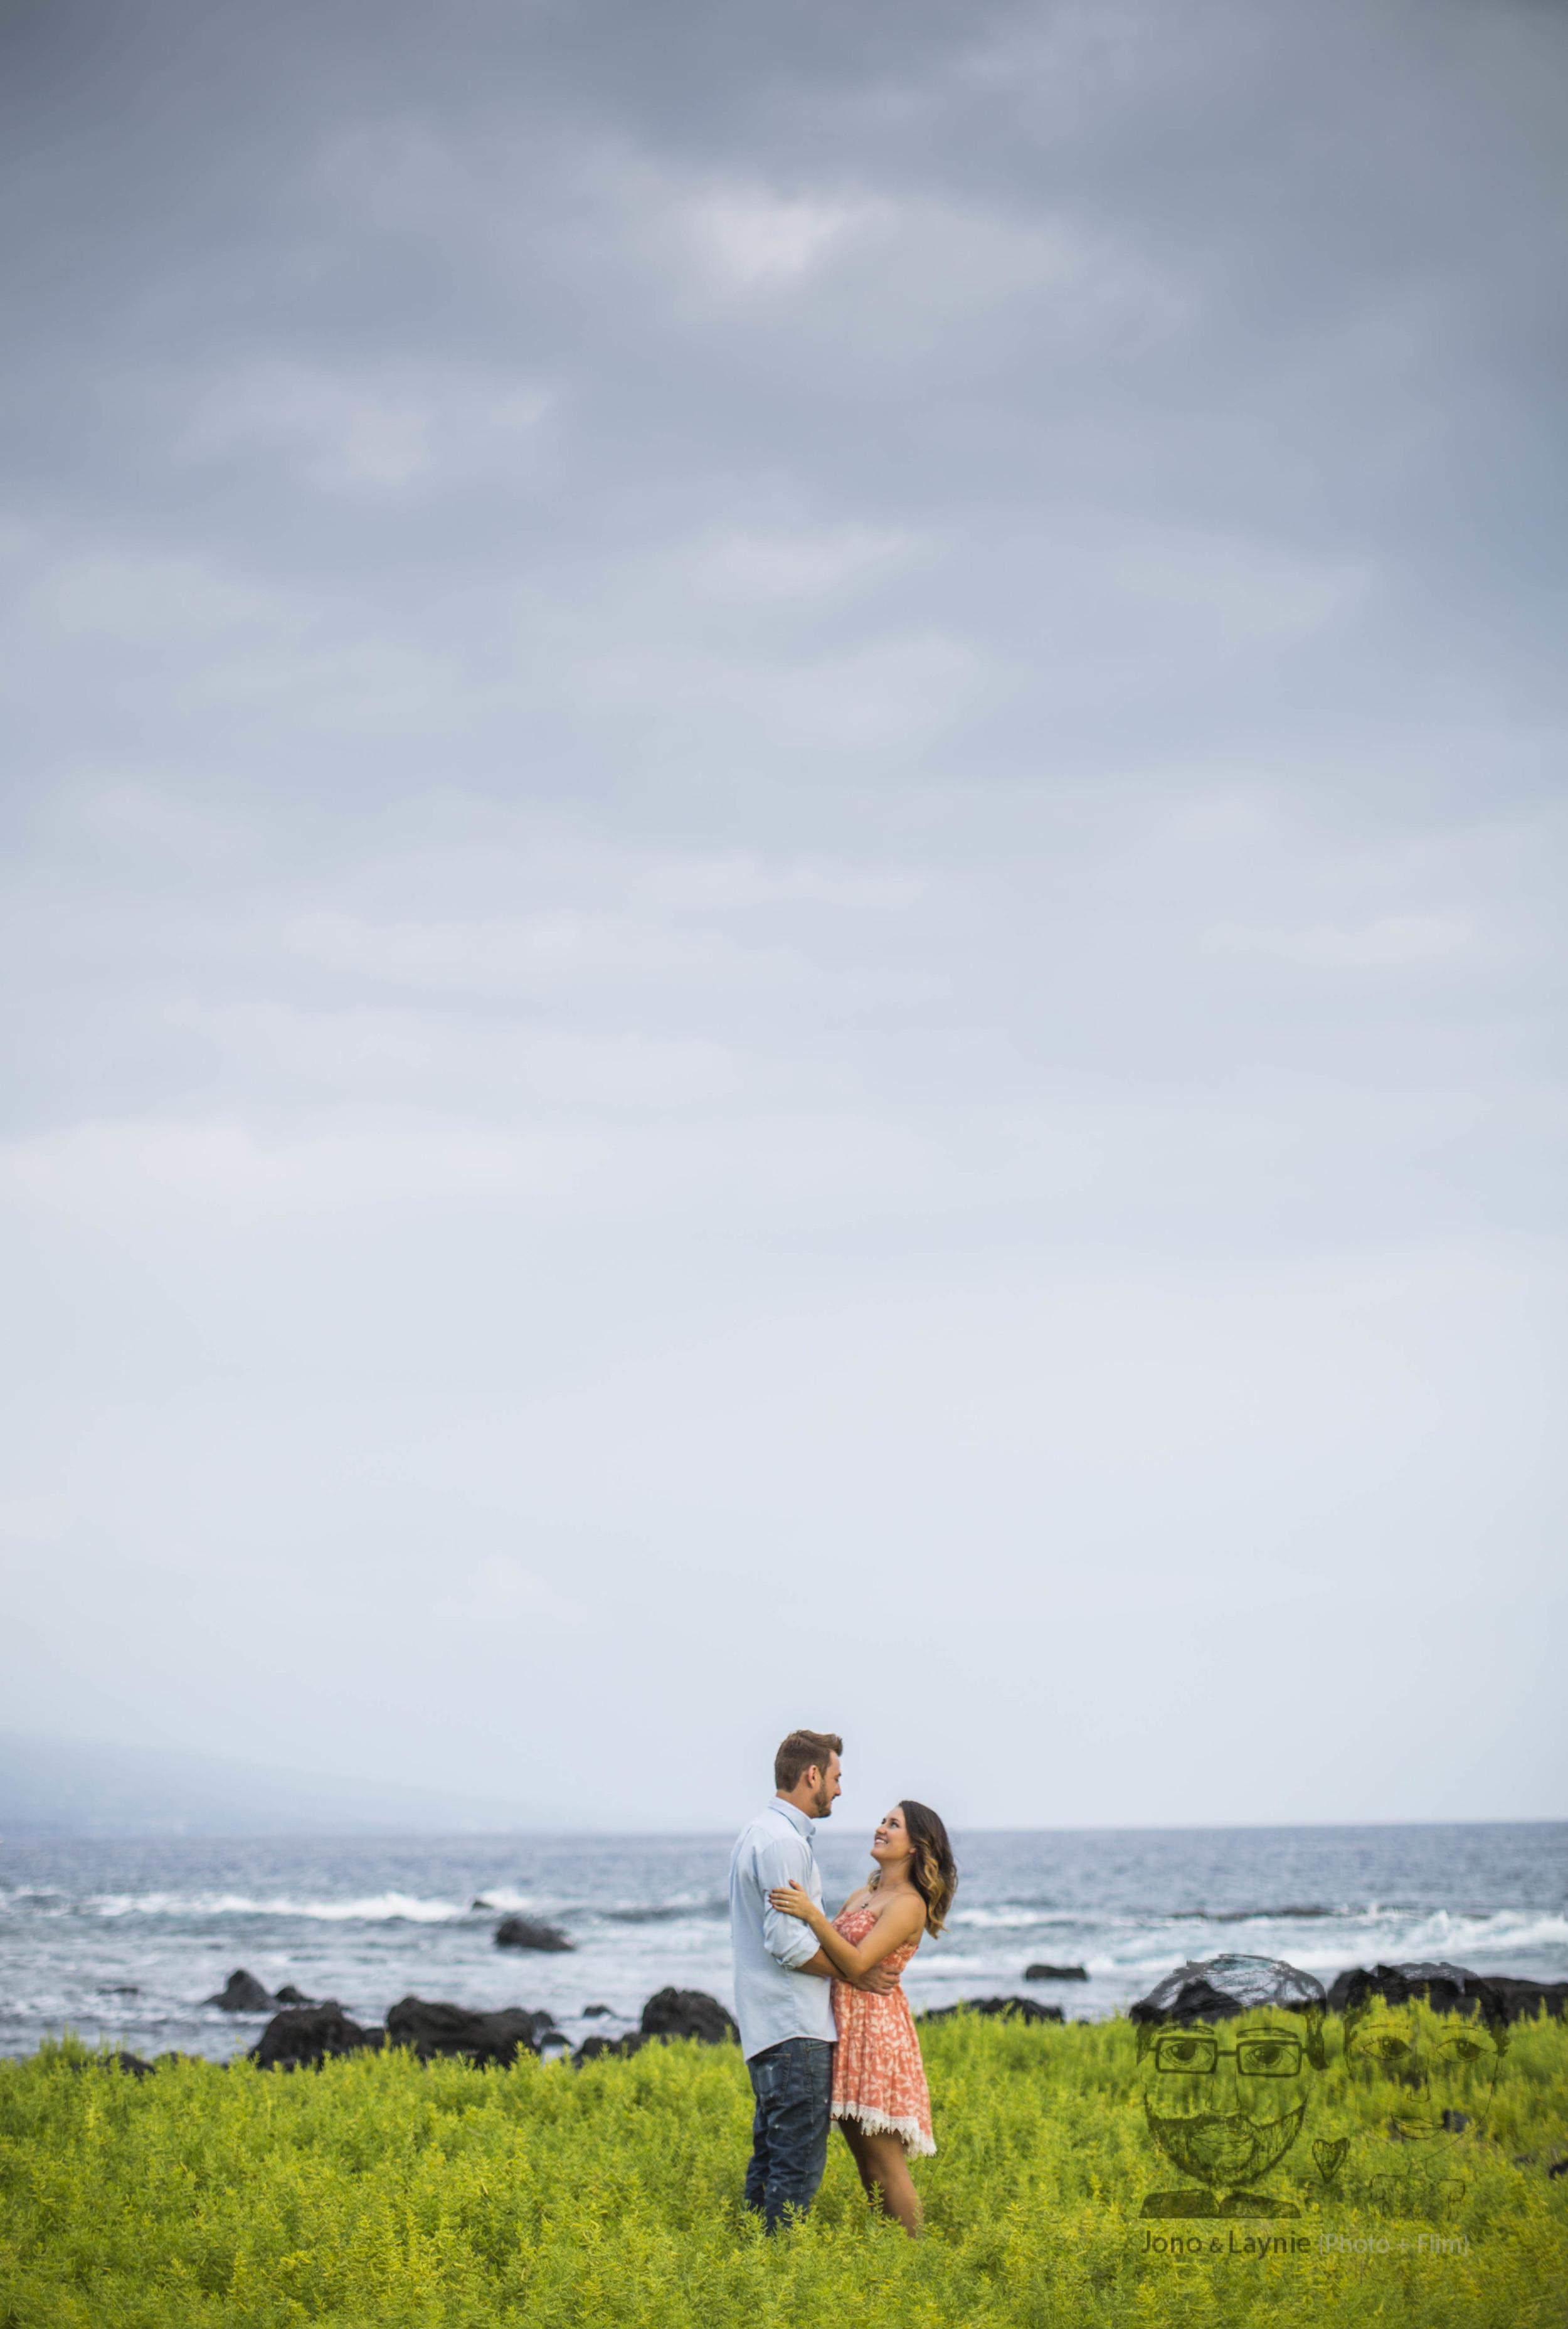 Jono & Laynie Co.-Kona, Hawaii-Engagement Session01.jpg